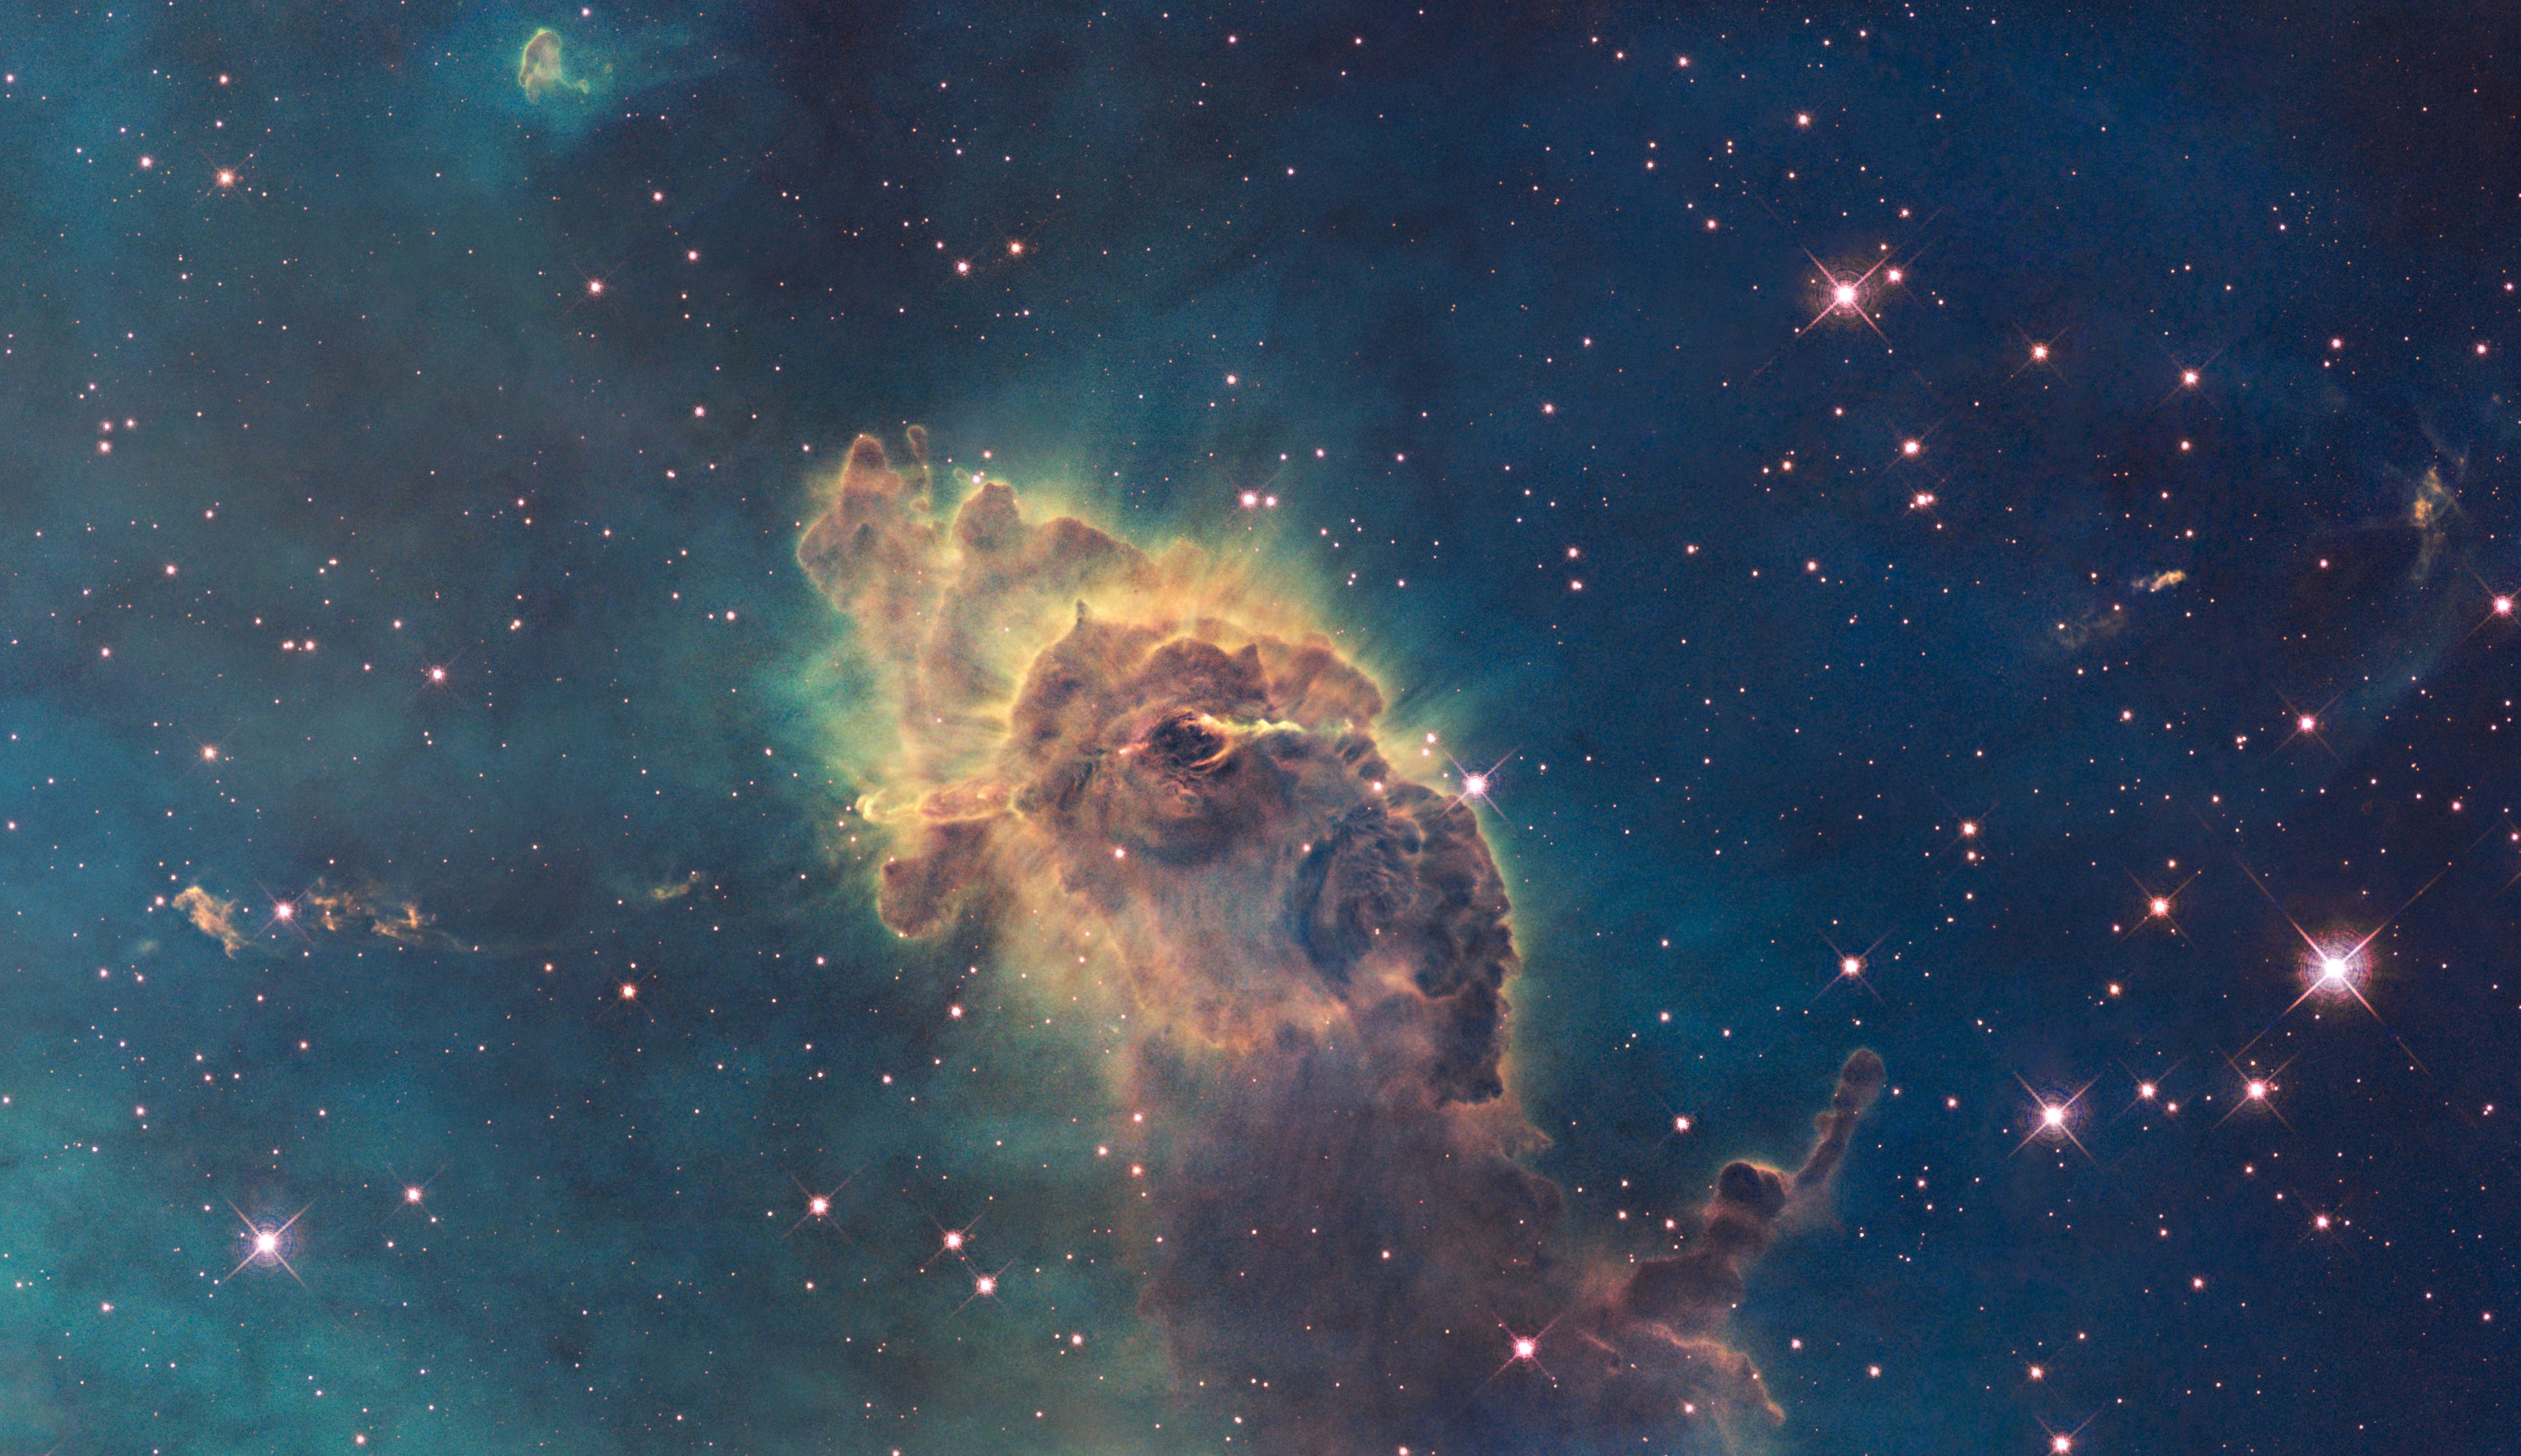 Carina Nebula via The Hubble Telescope